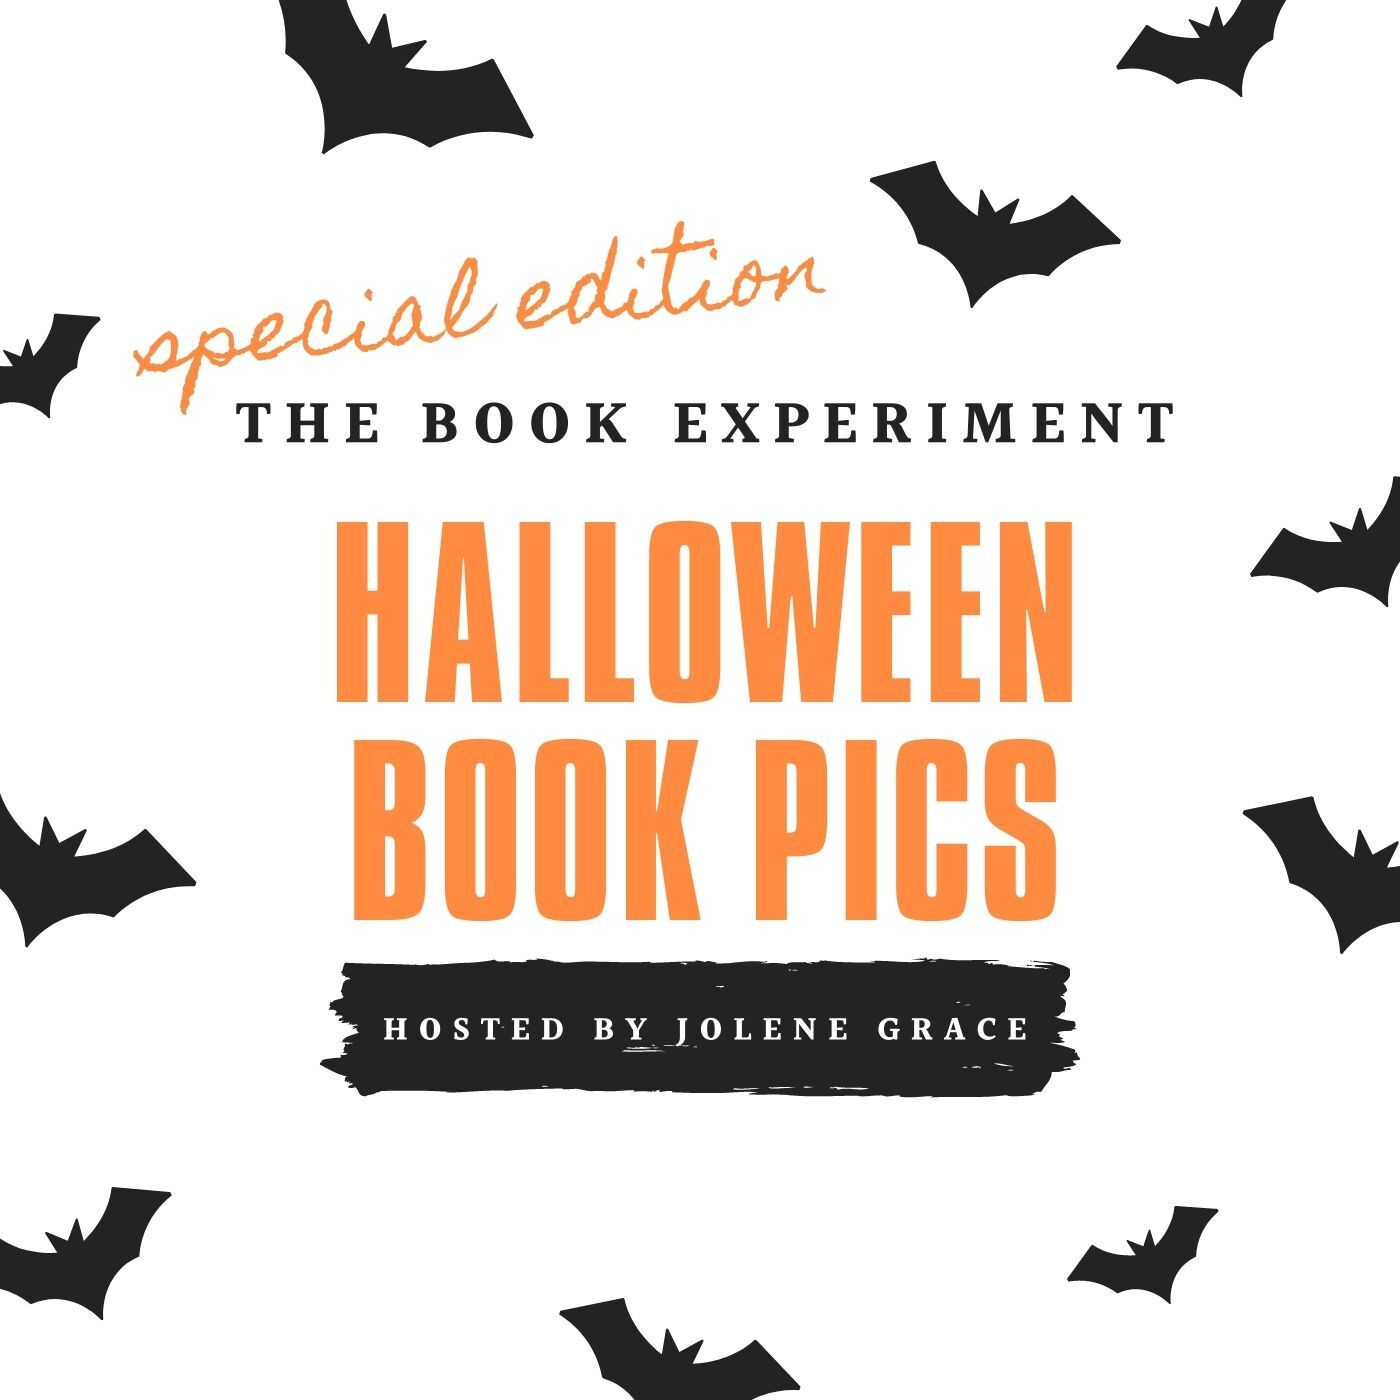 Halloween Book Picks